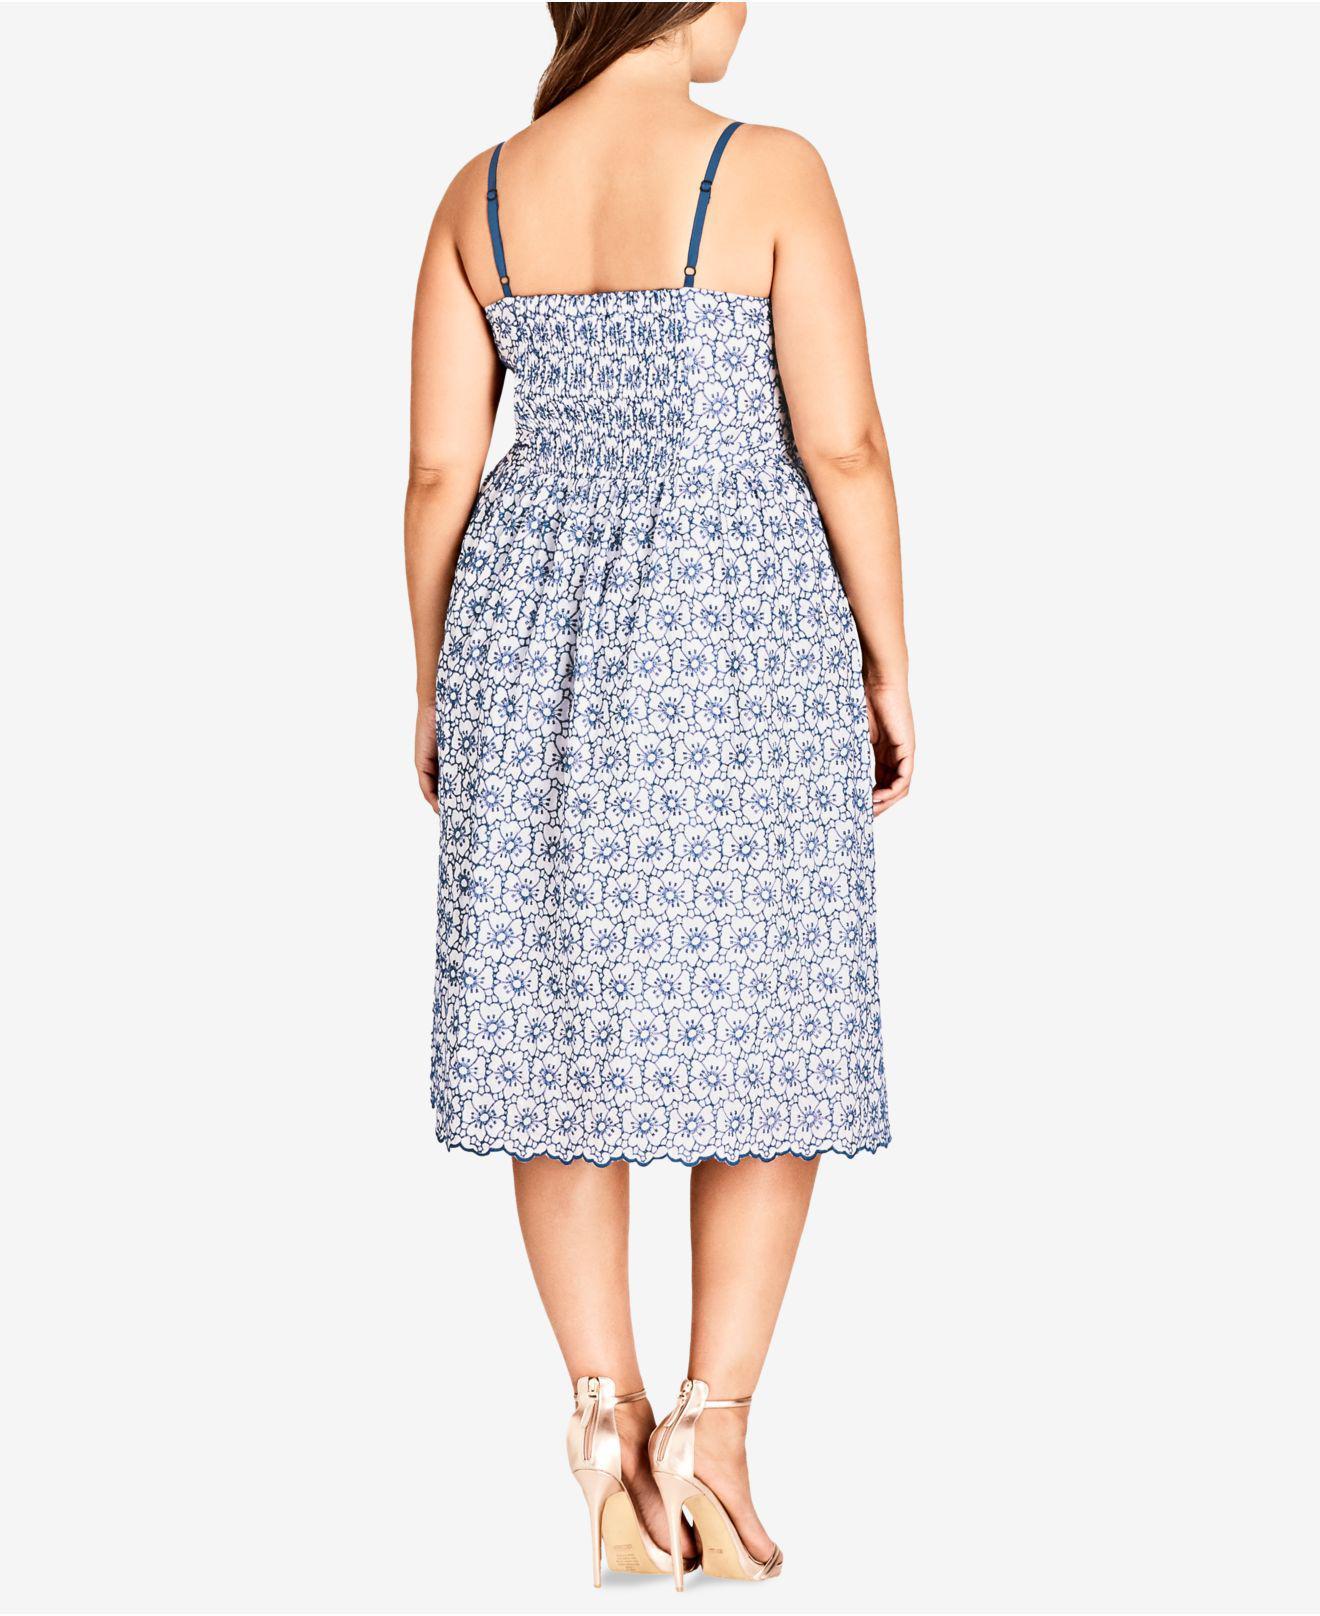 6e8caf931bc Lyst - City Chic Trendy Plus Size Cotton Fit   Flare Midi Dress